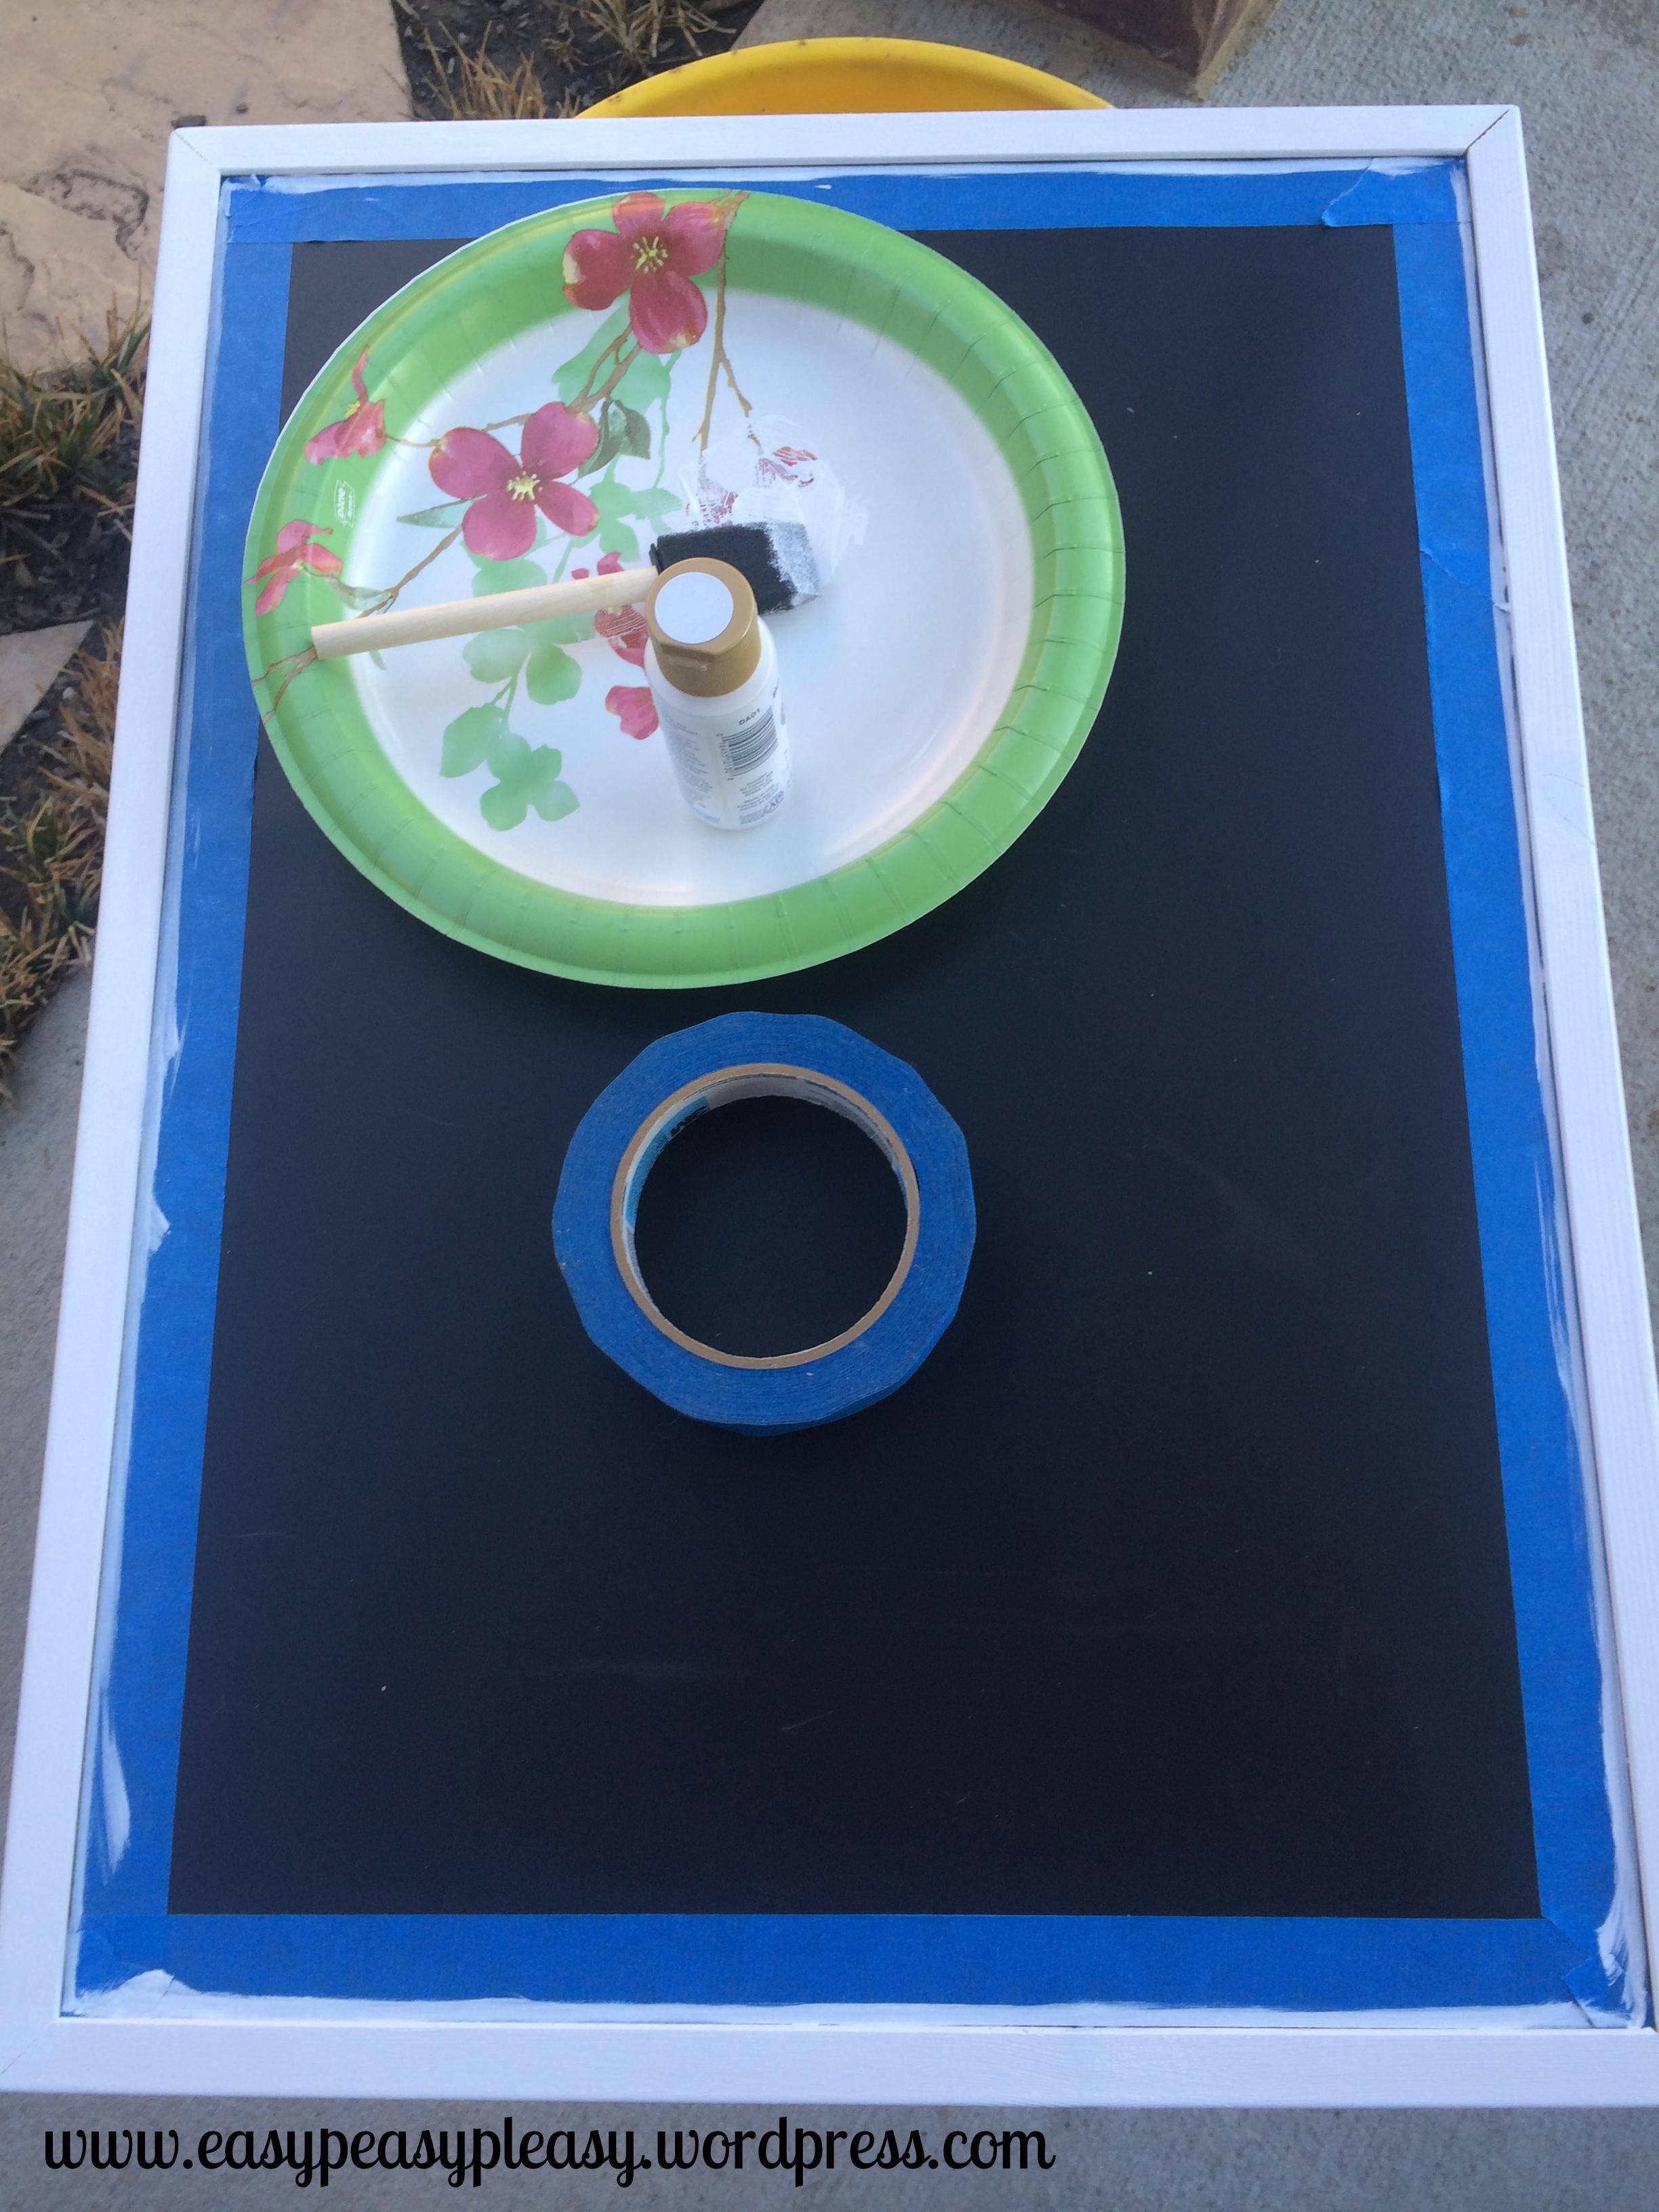 painting a chalkboard frame DIY